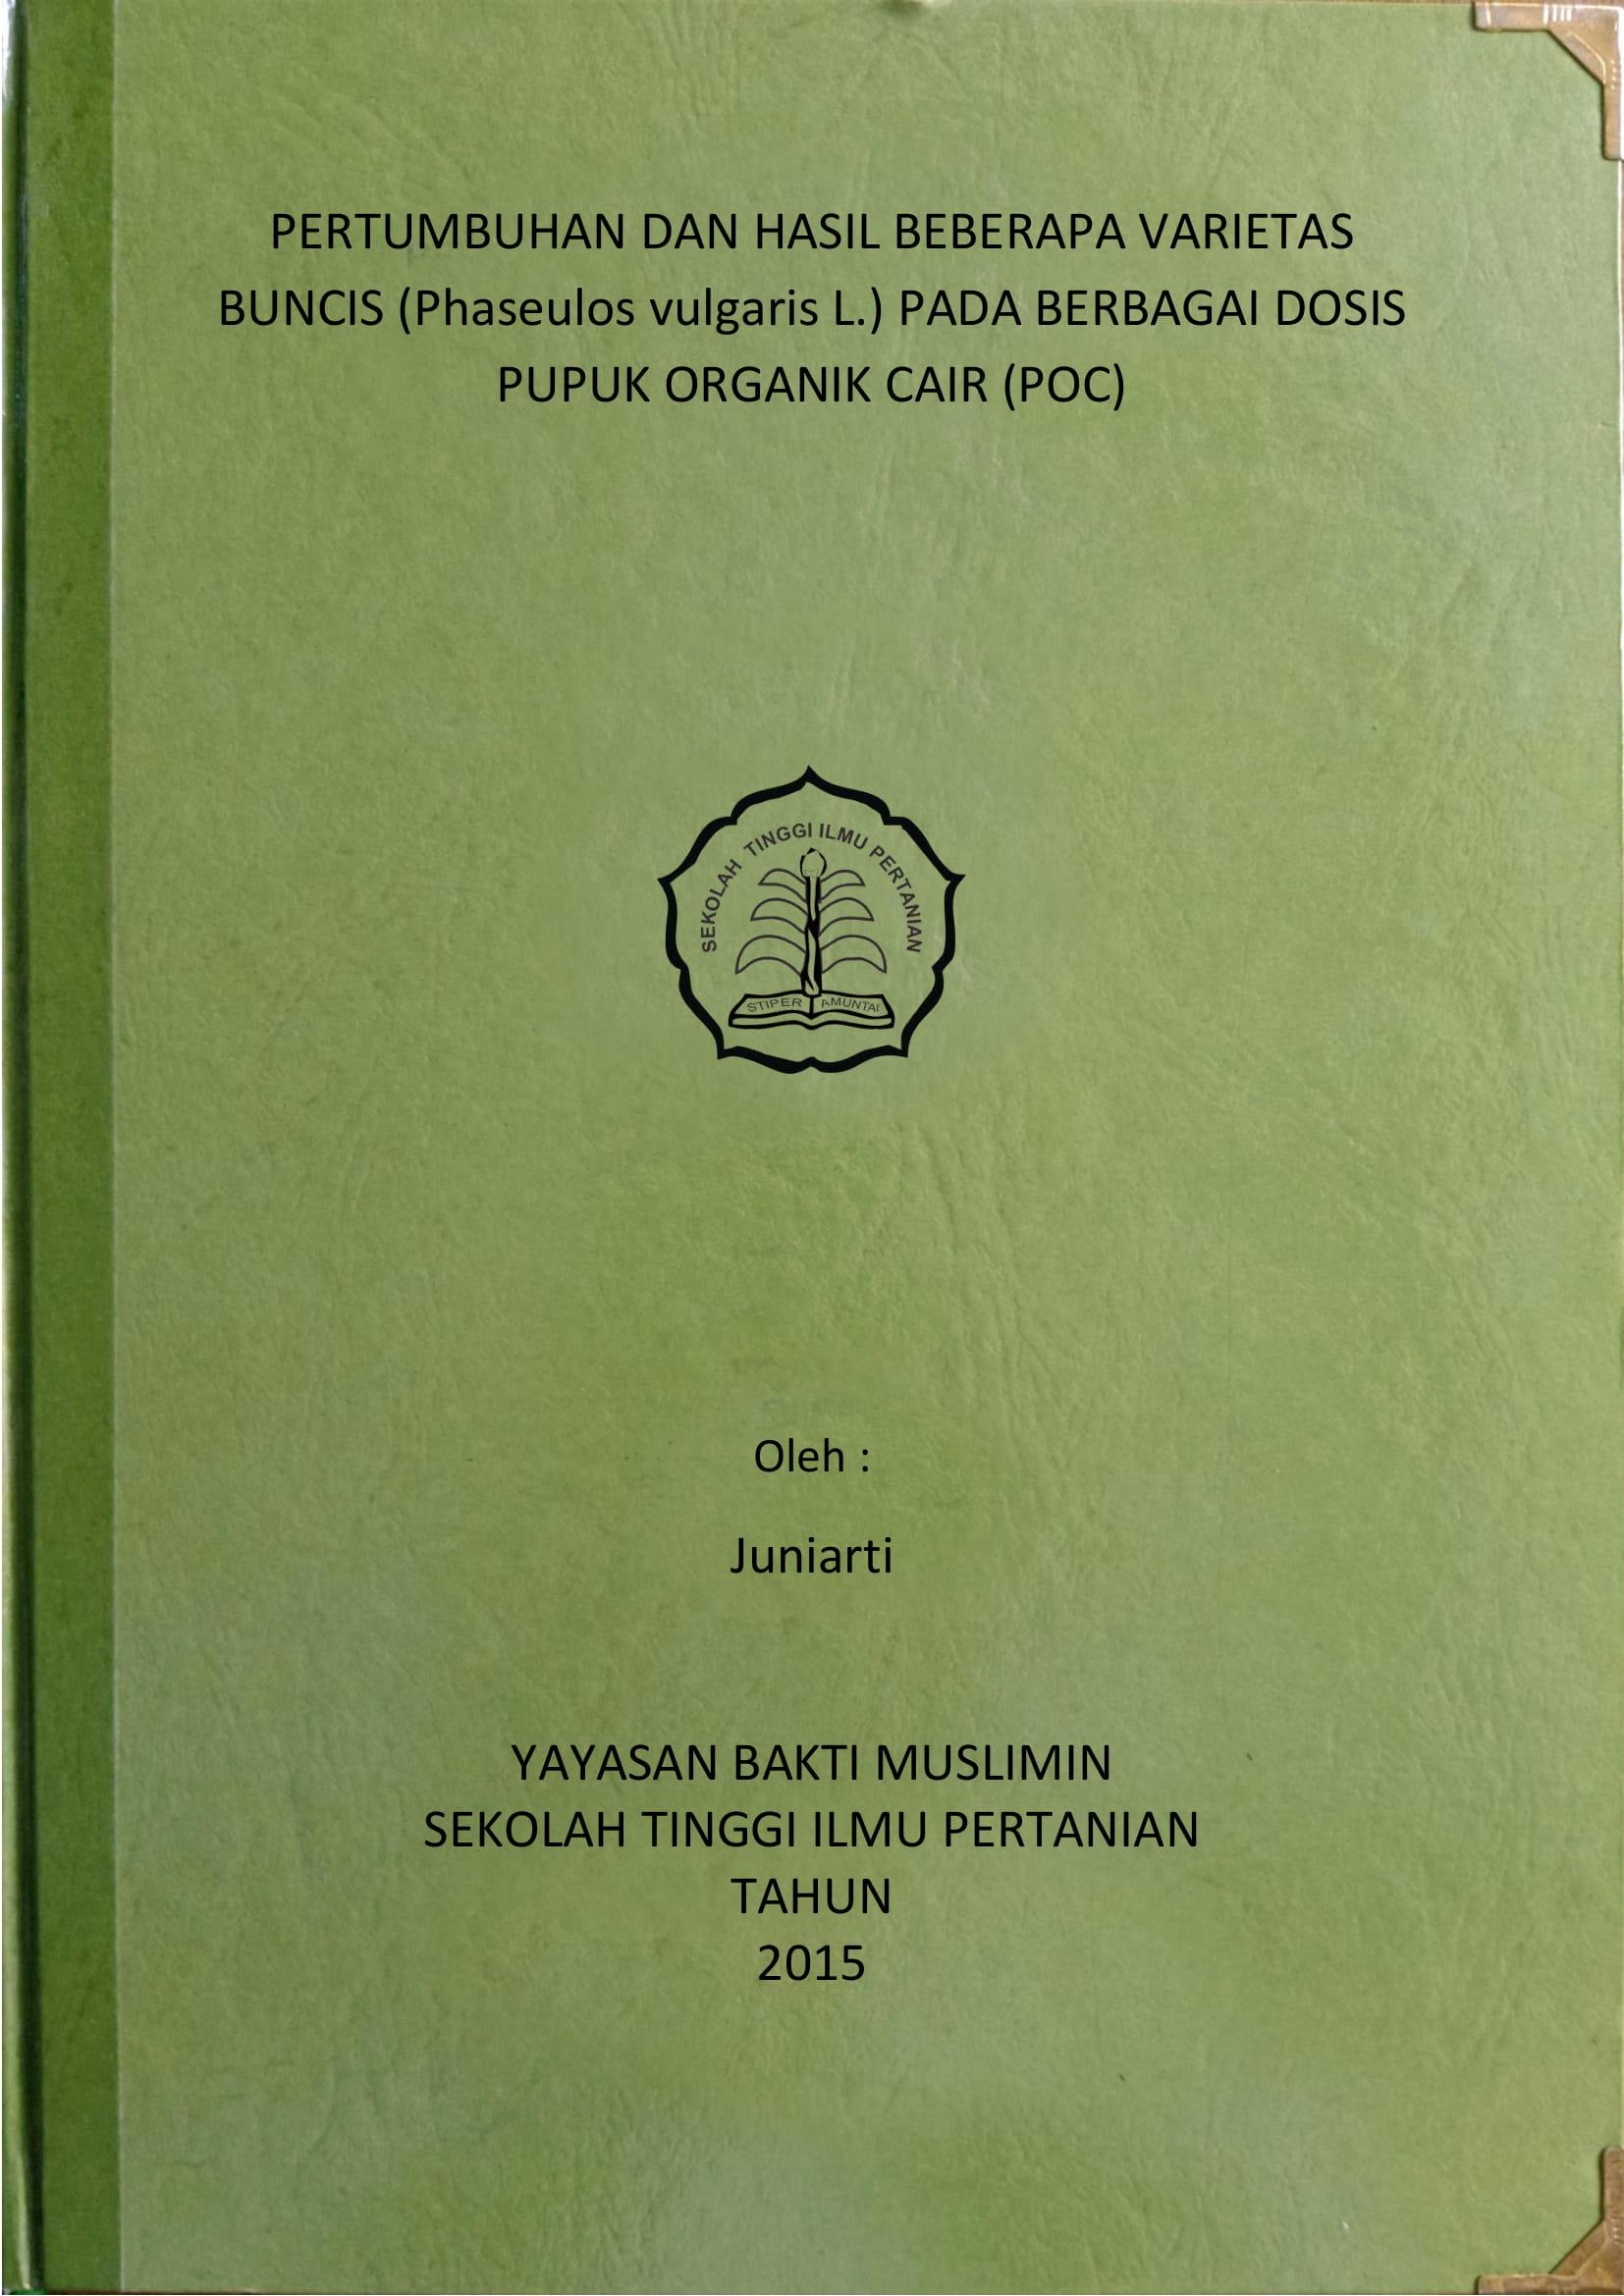 THP-16